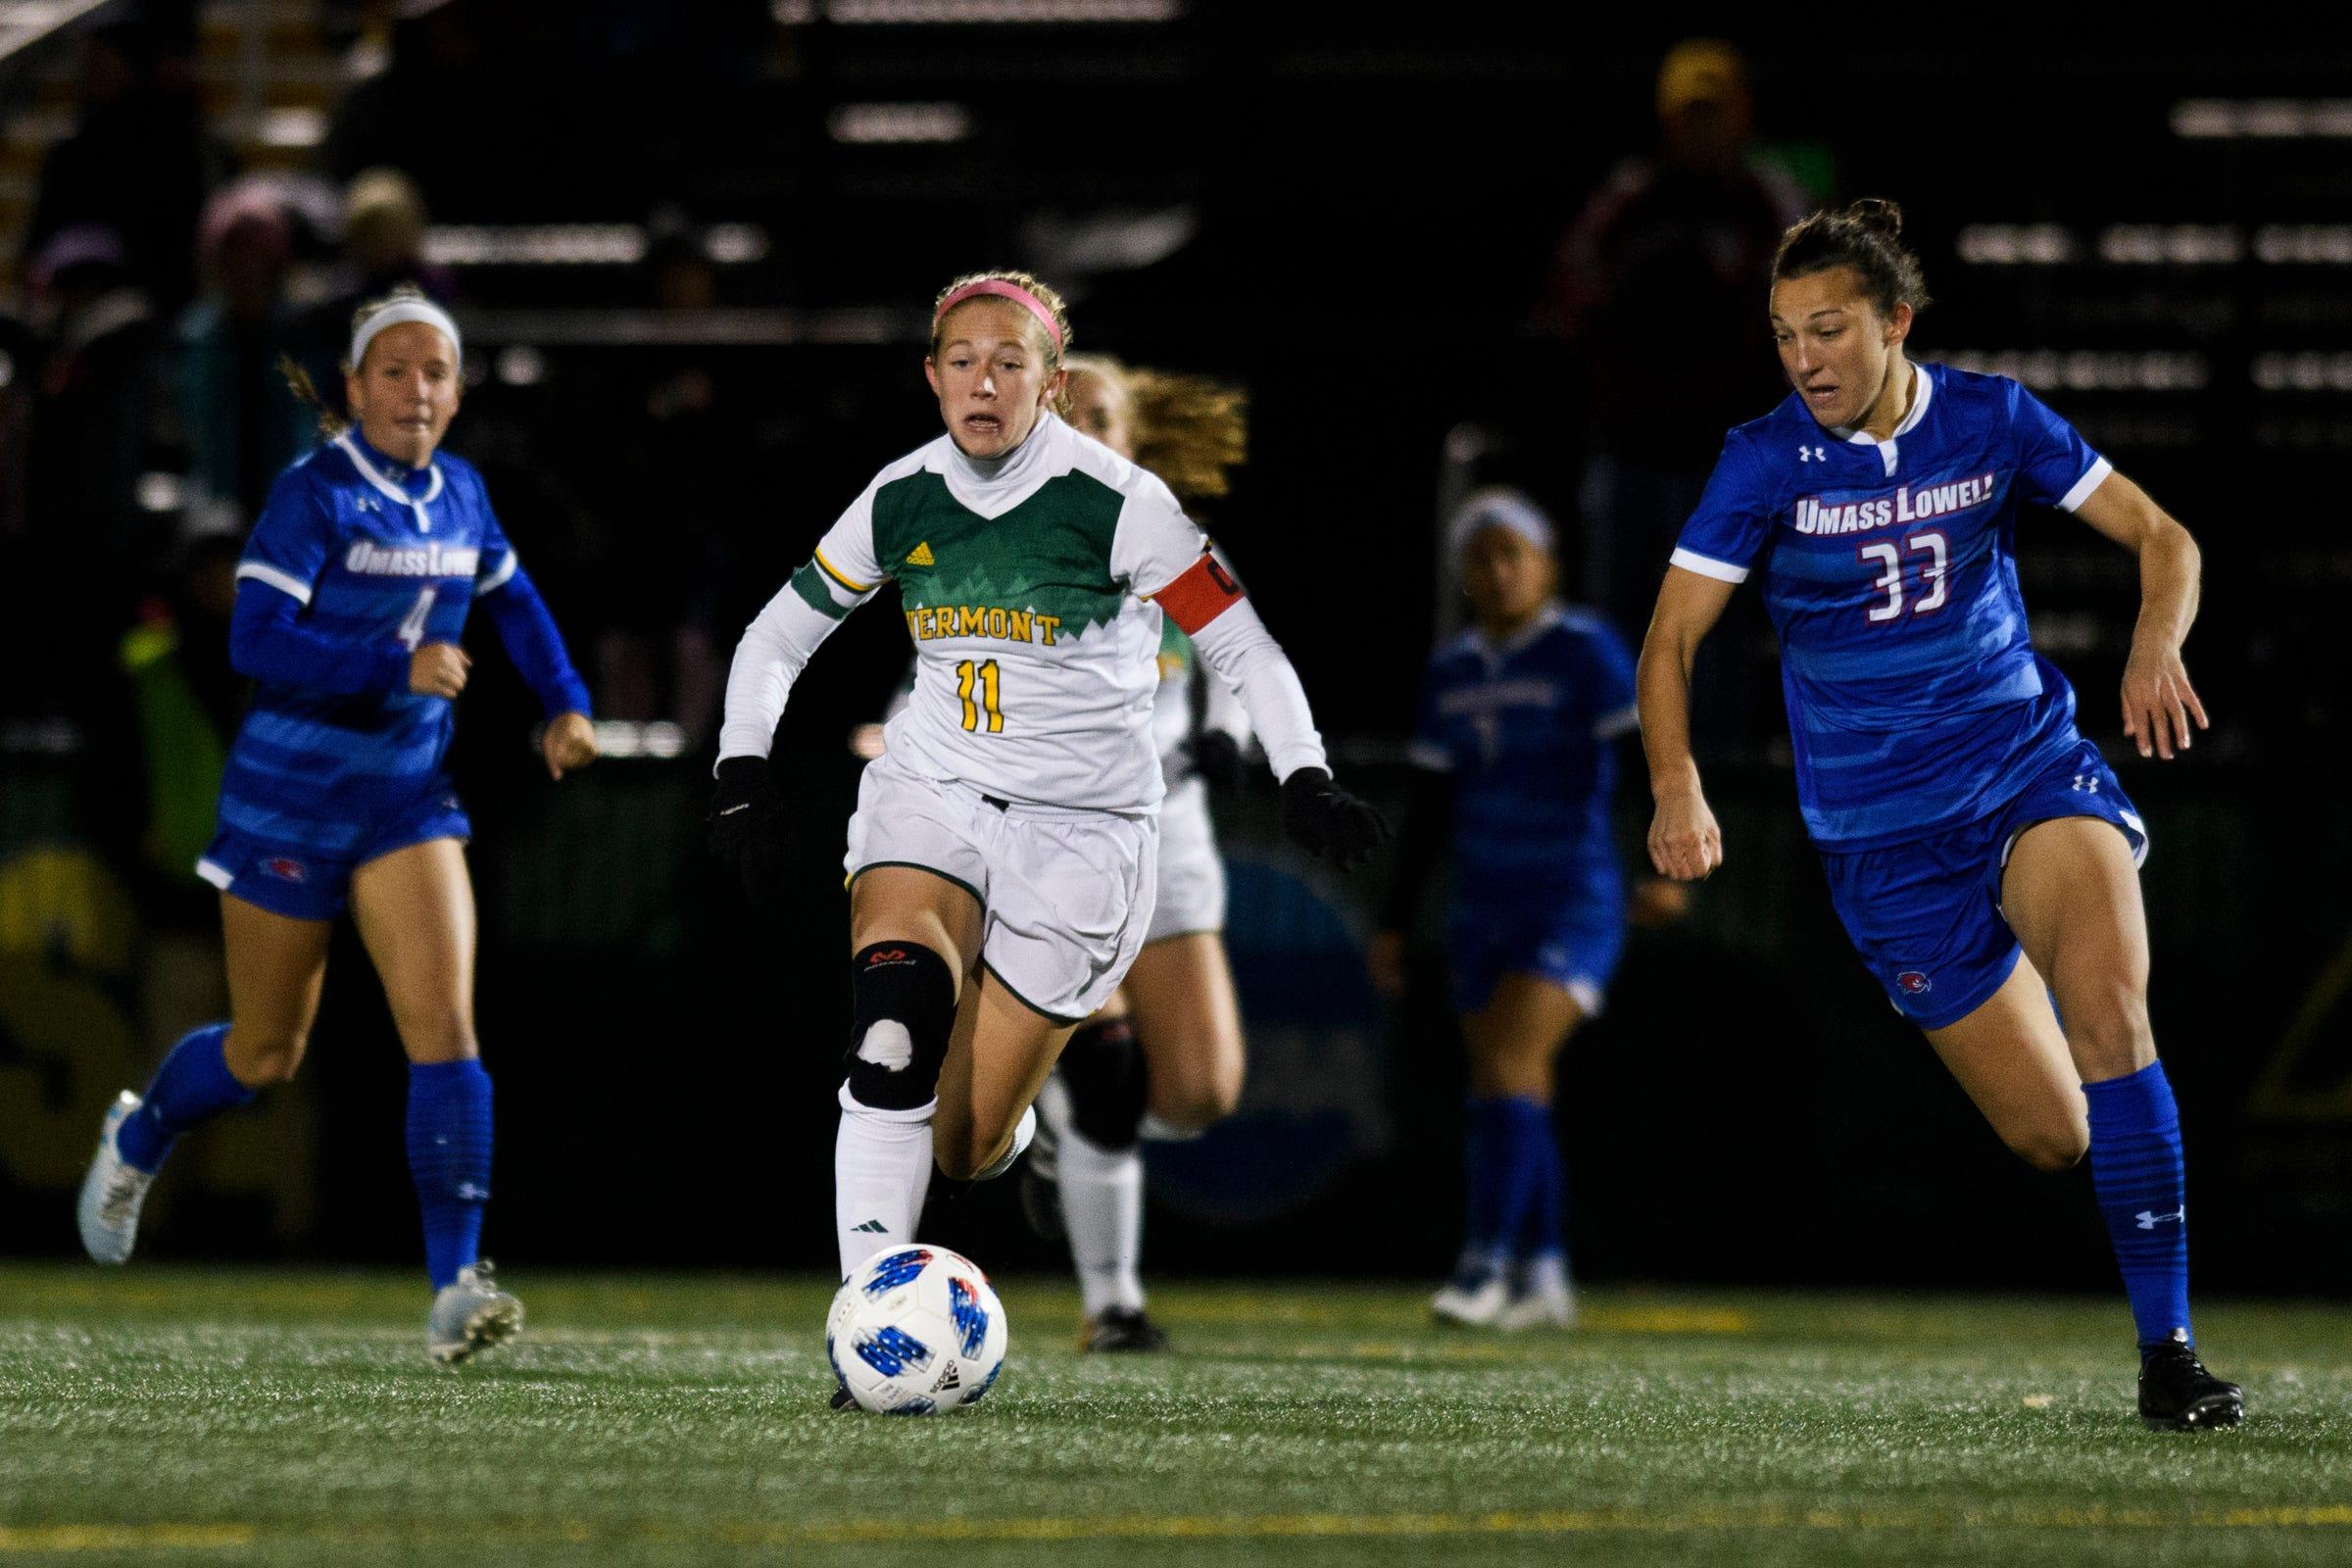 Late winner stuns UVM women's soccer in loss to UMass-Lowell | Burlington Free Press